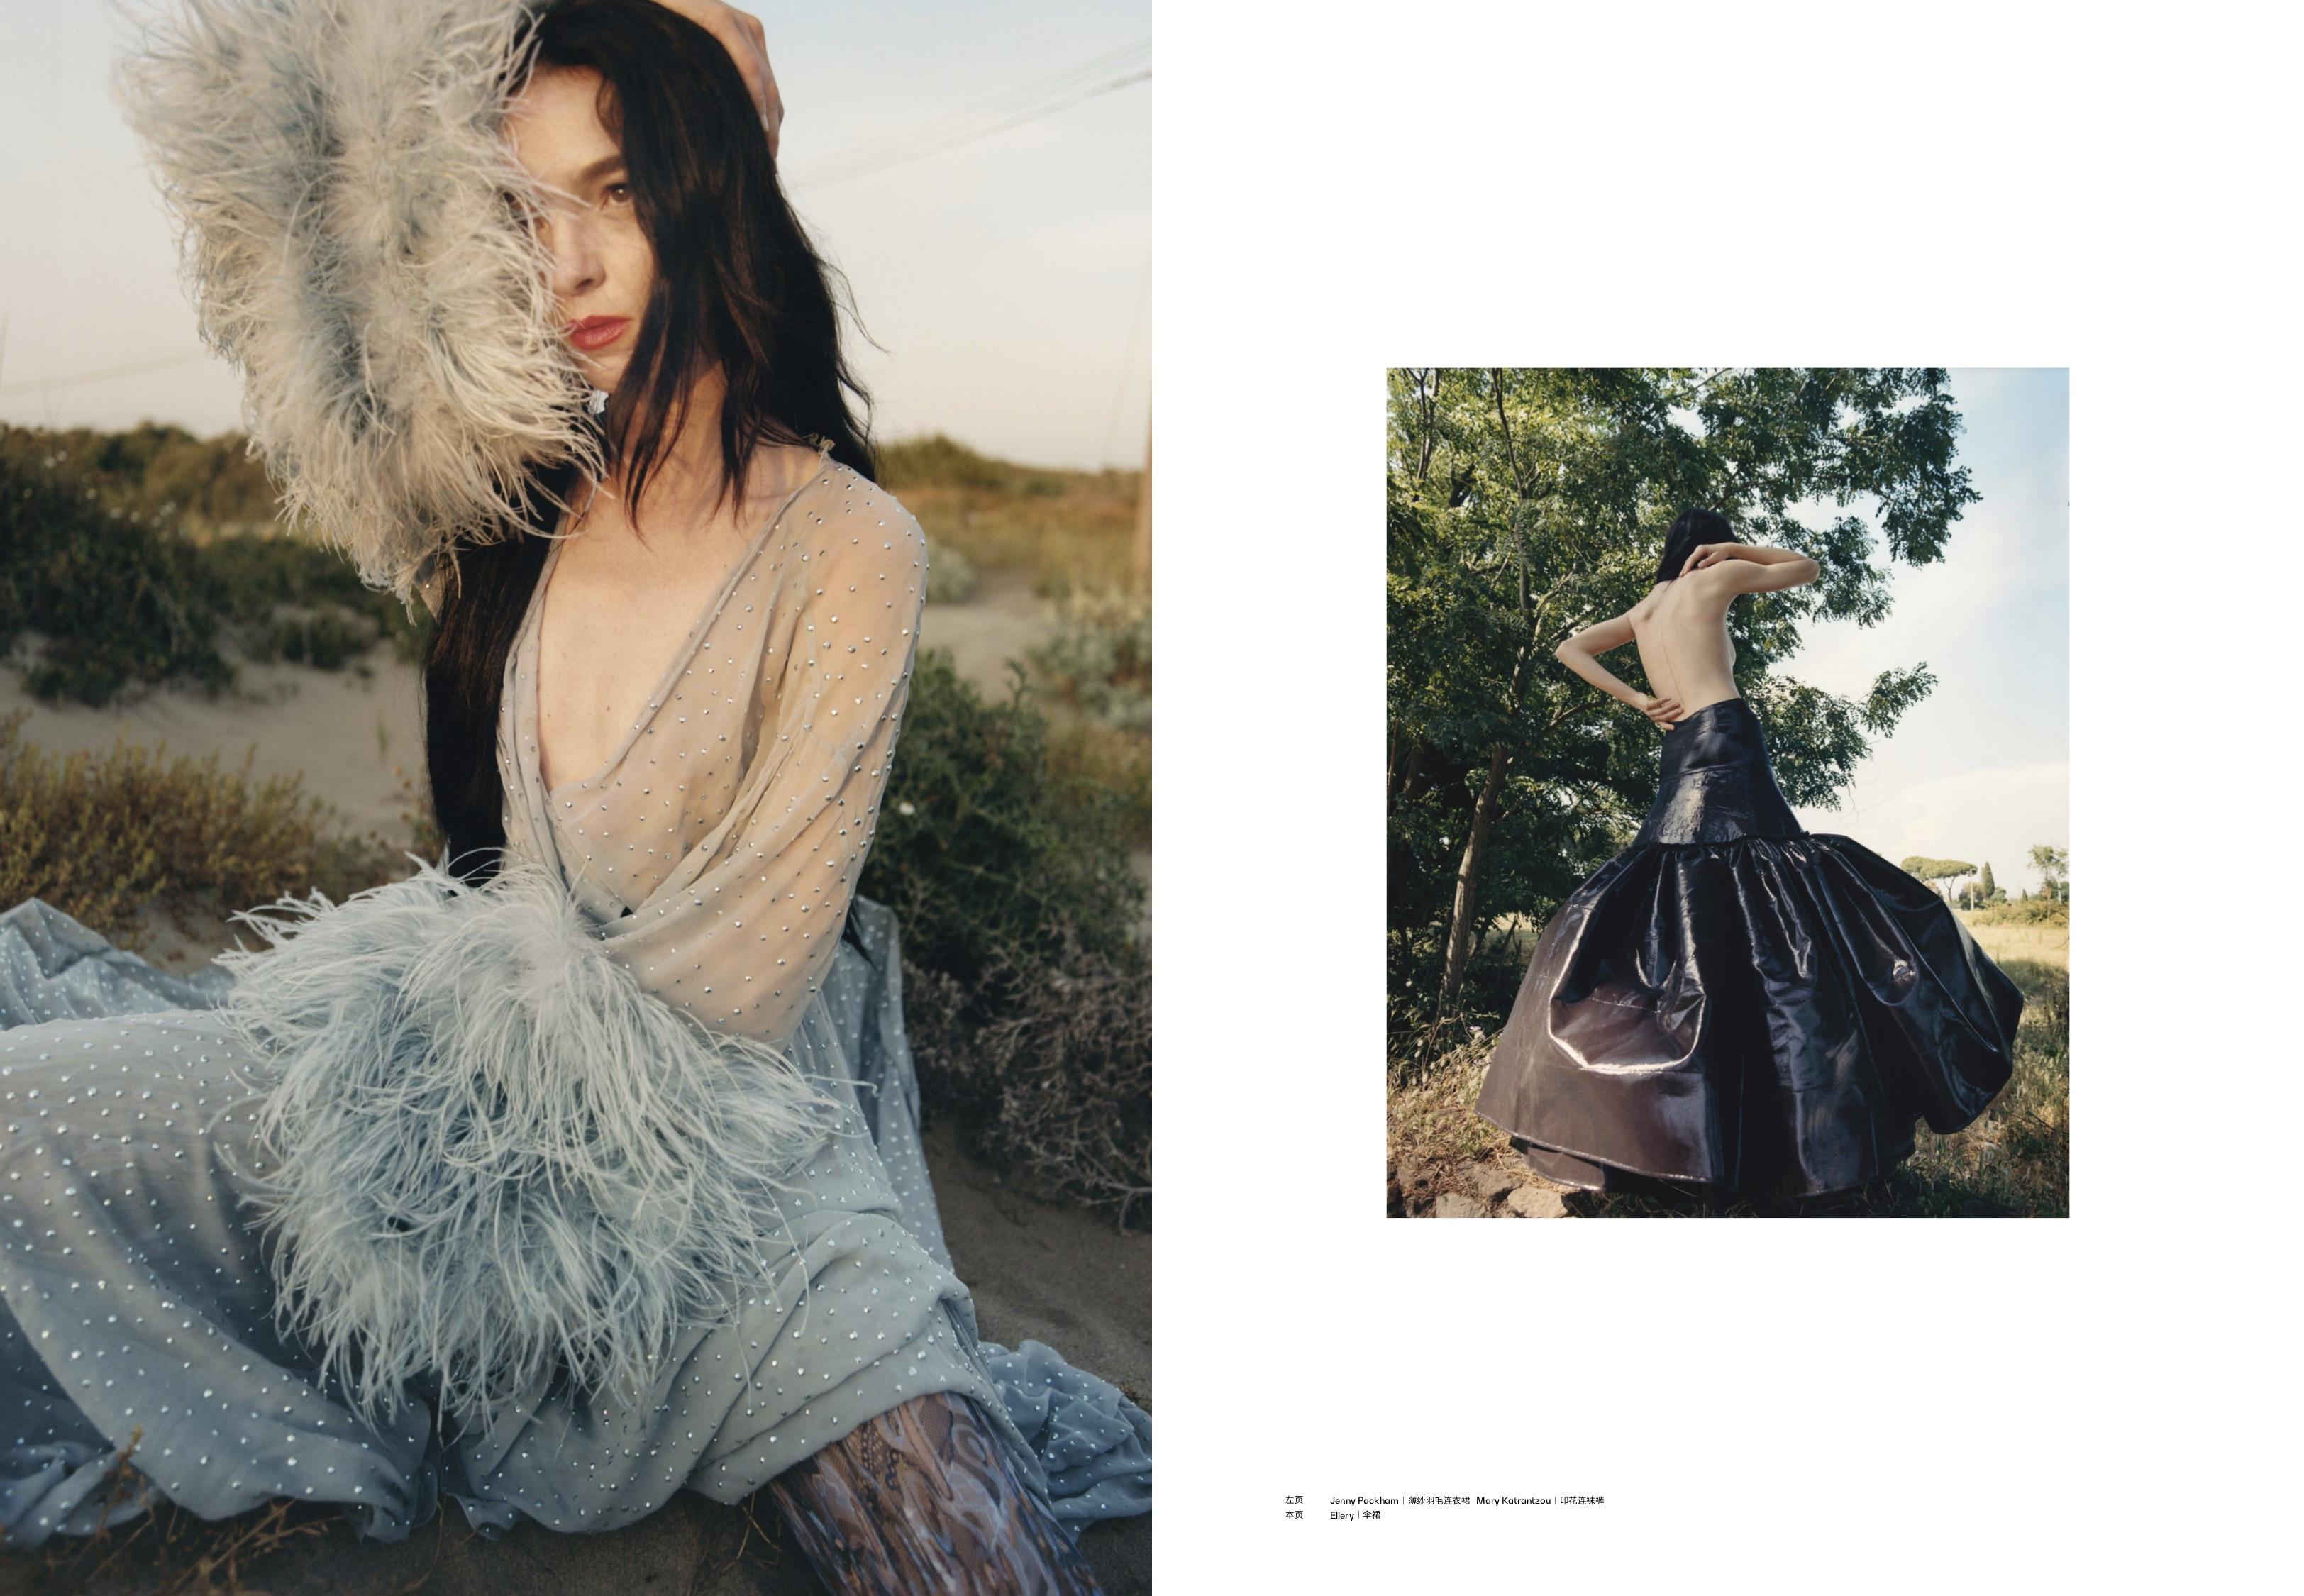 MODERN WEEKLY - 2019 Photographer: Nadine Ijewere Model: Mariacarla Boscono Stylist: Nathan Klein Location: Rome